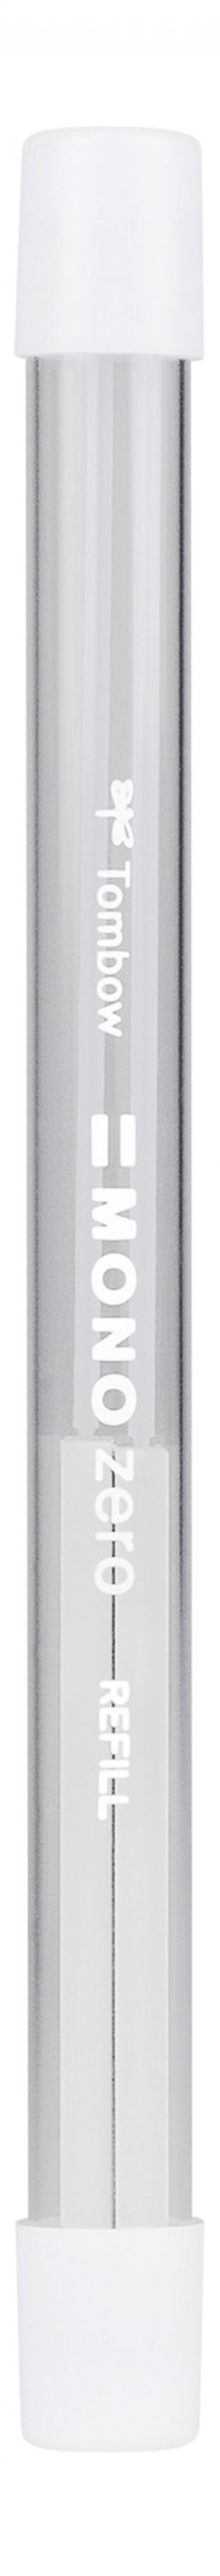 Tombow Eraser MONO Zero Rectangular Tip Refill